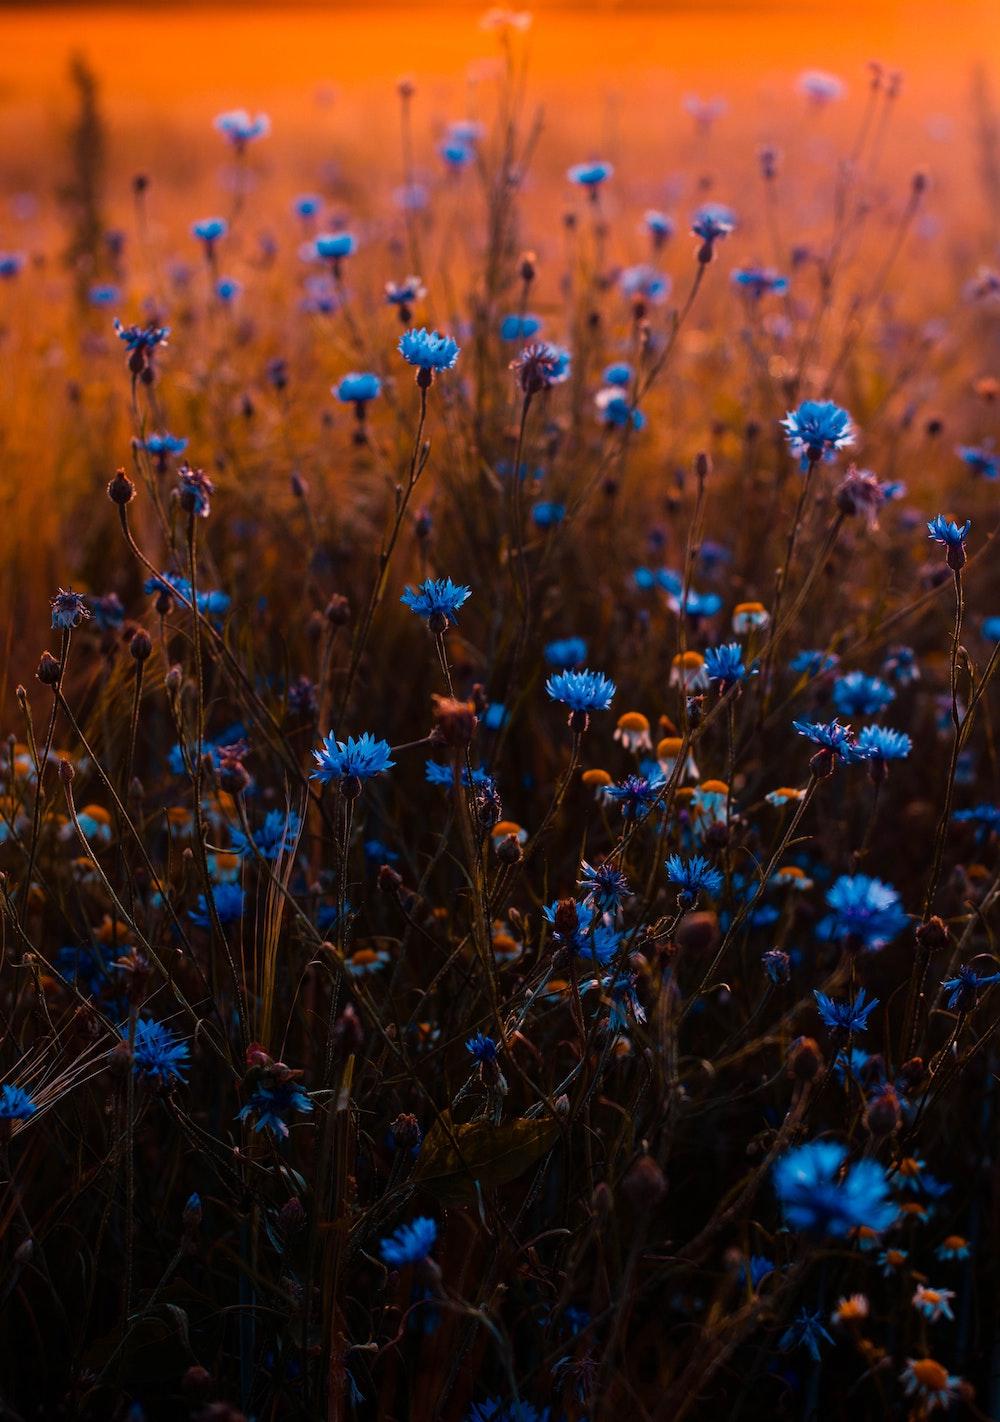 blue-flowers-blur-buds-673857.jpg